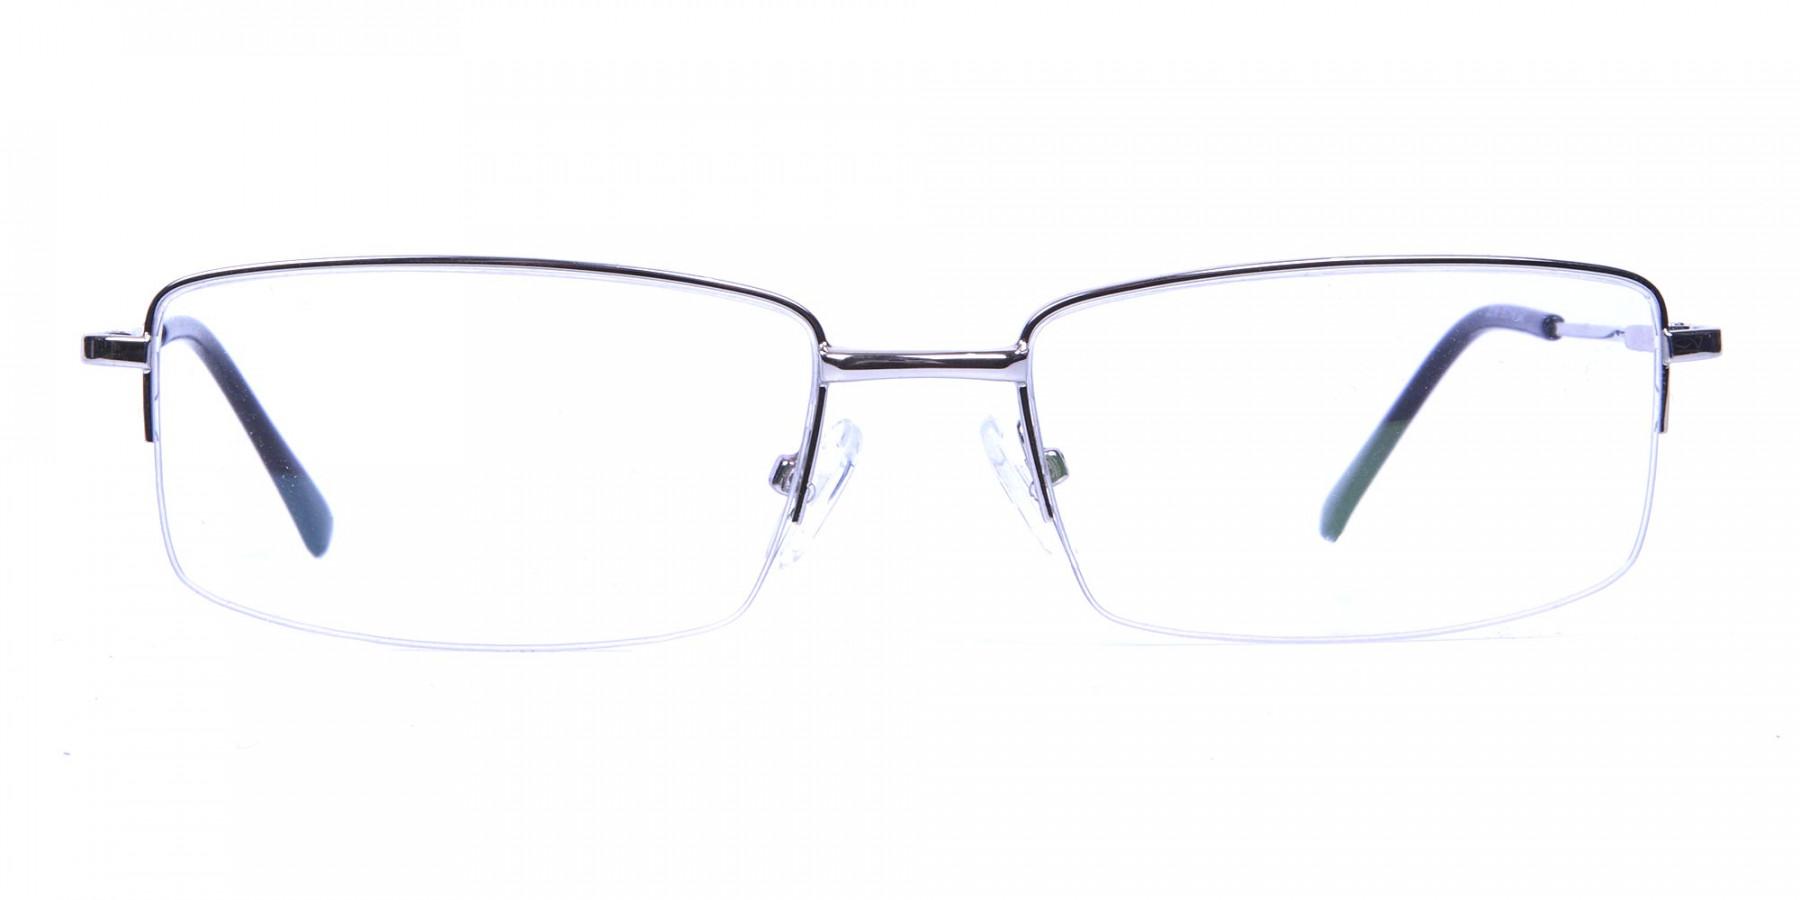 Rectangular glasses in Silver- 1